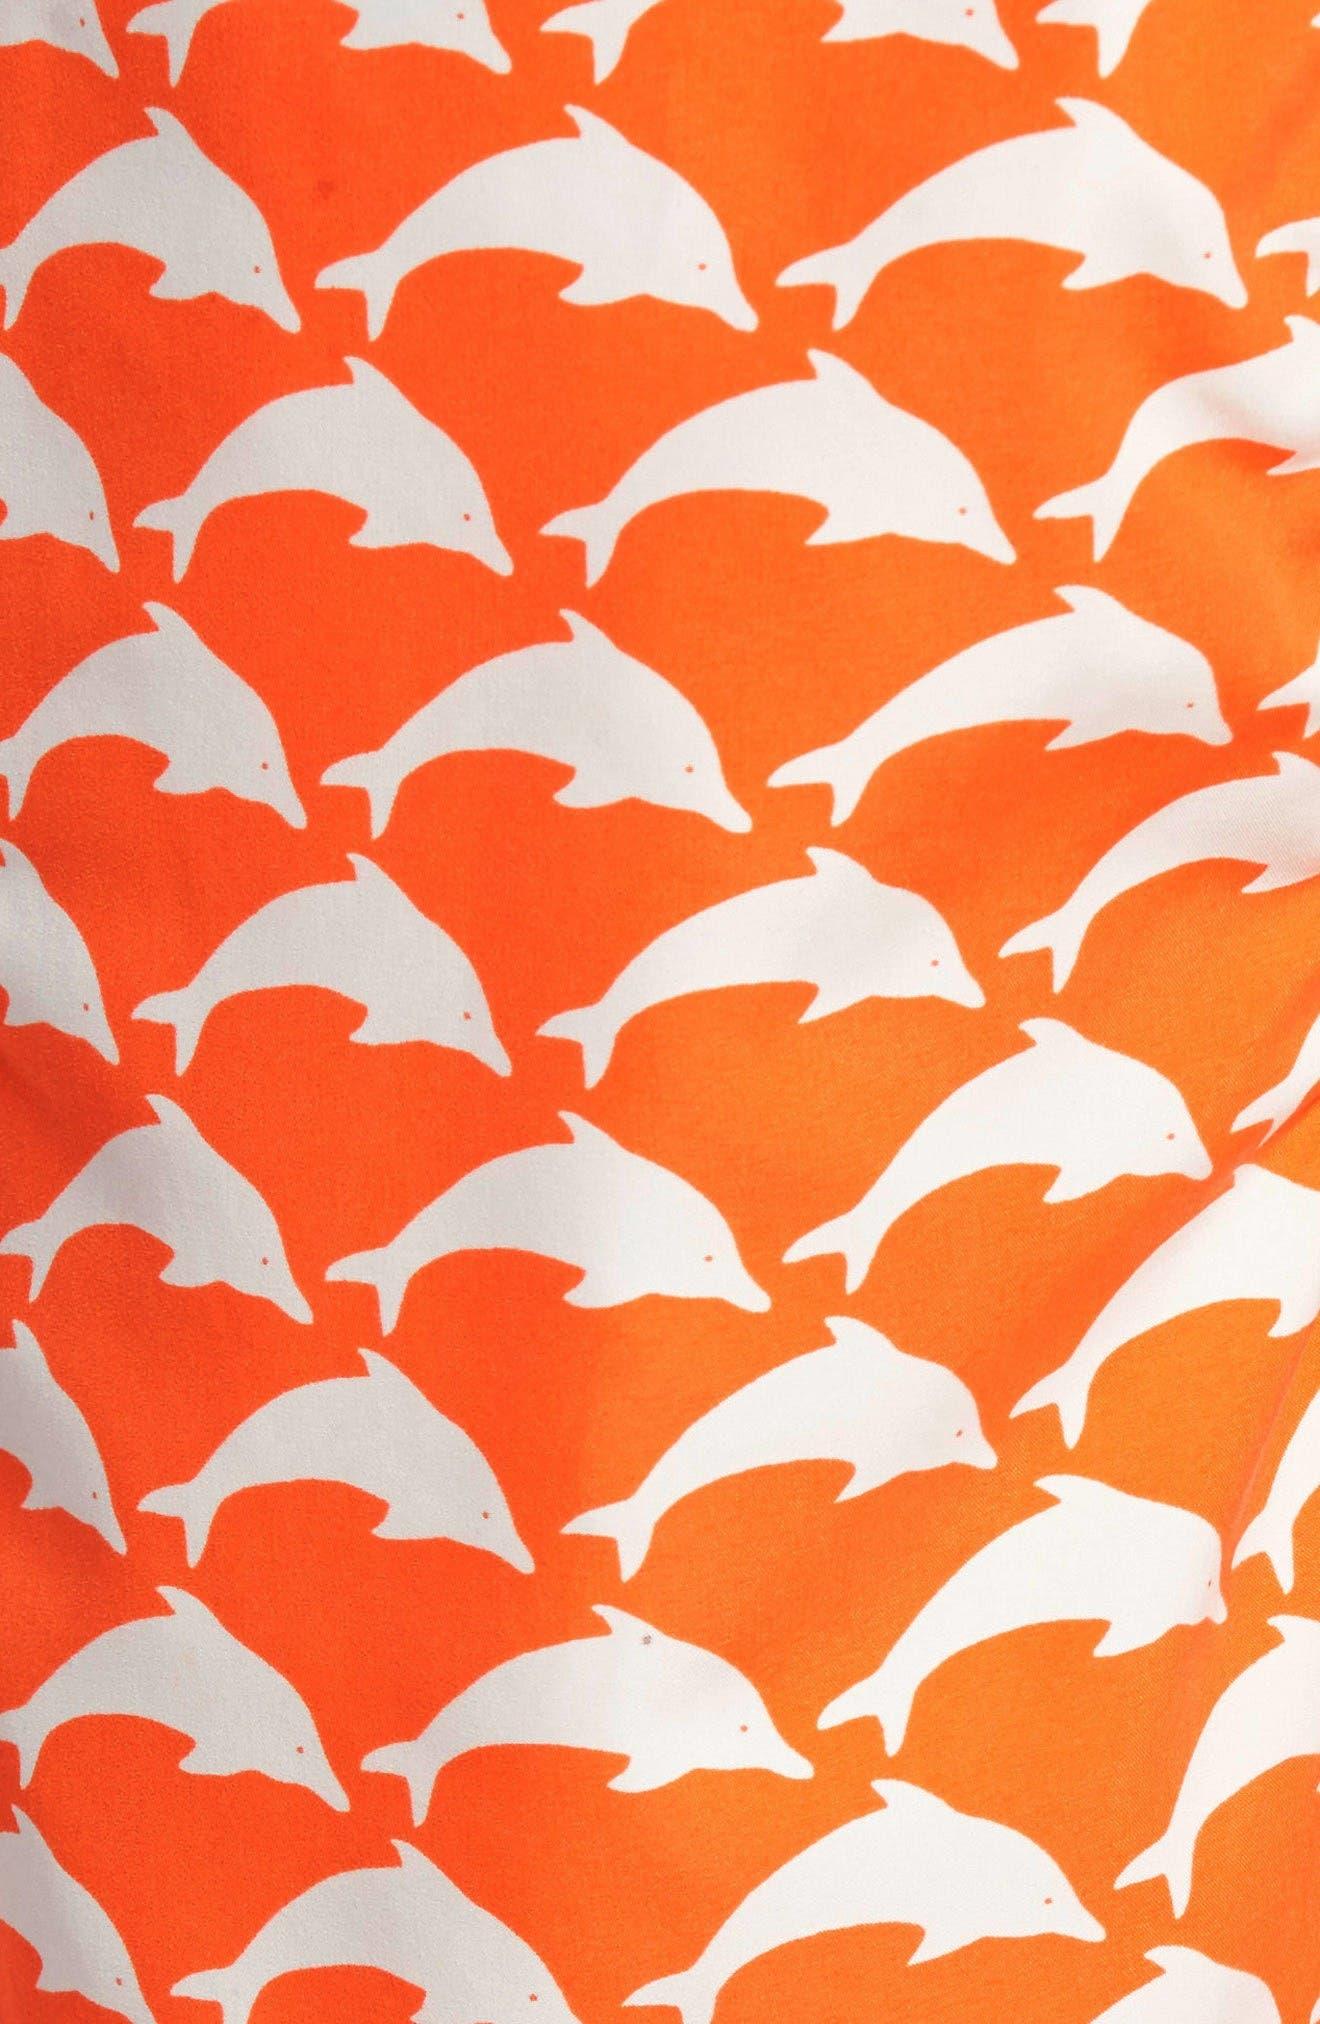 Dolphin Print Swim Trunks,                             Alternate thumbnail 5, color,                             Orange White